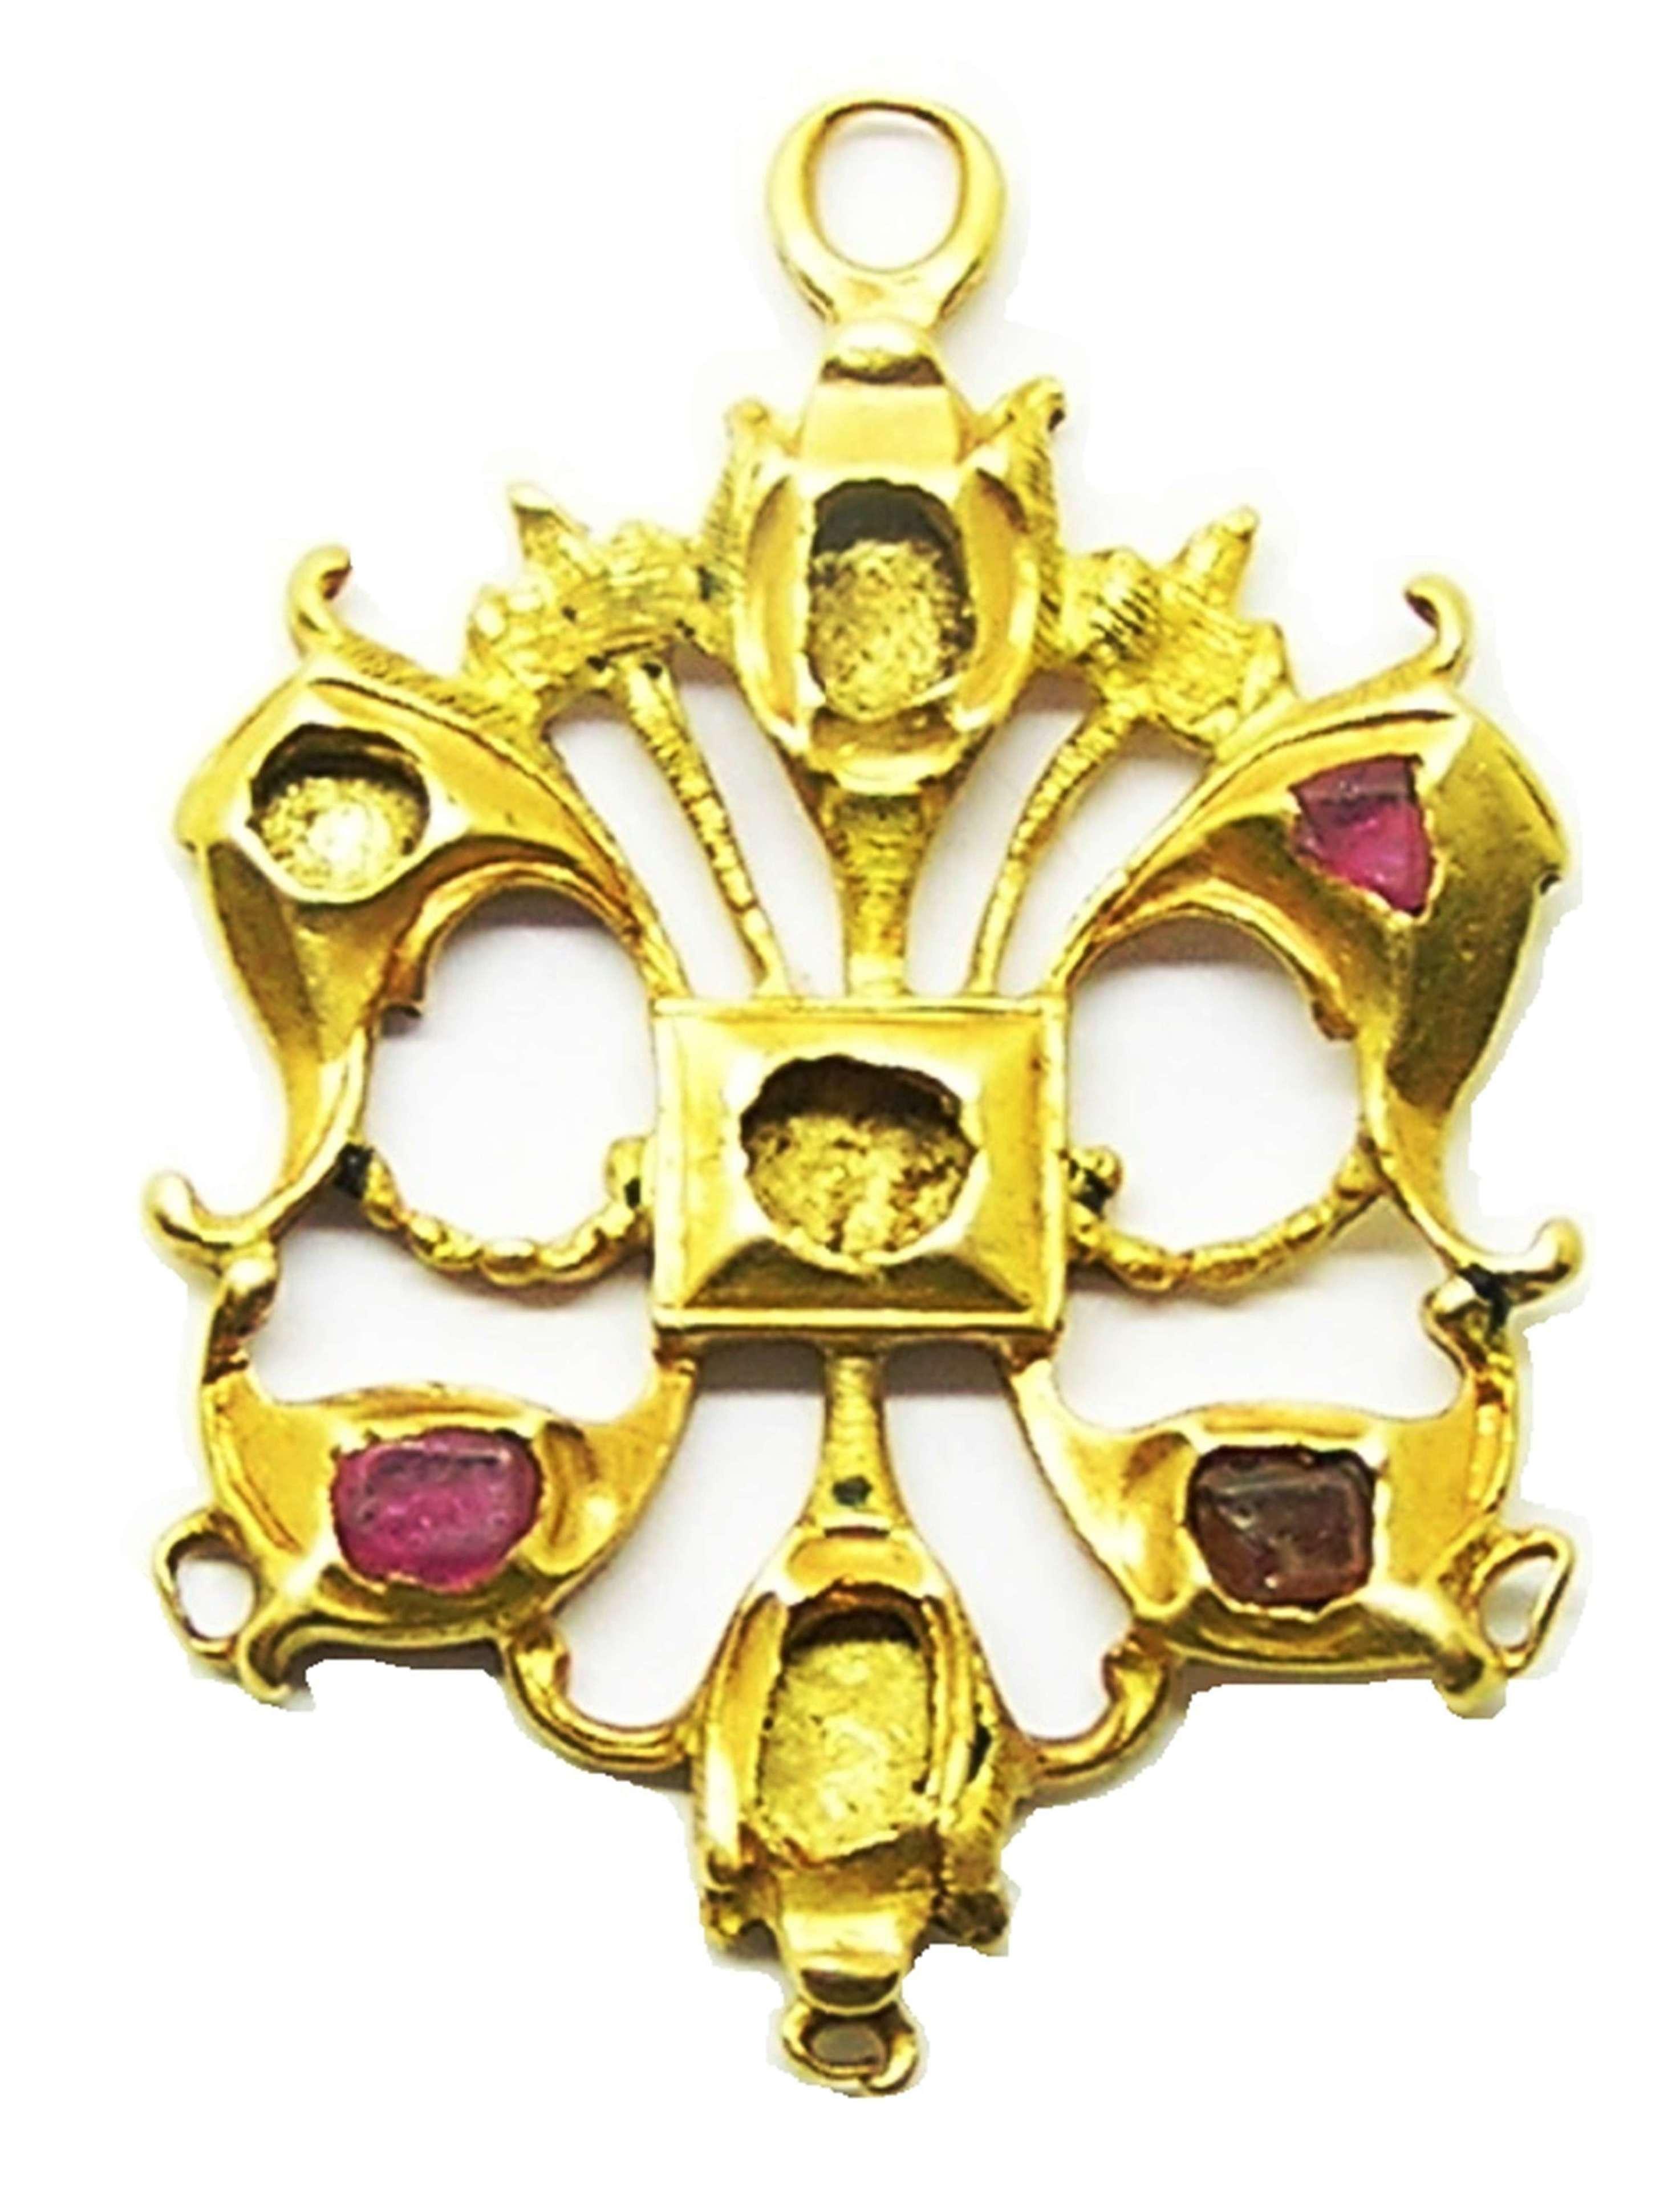 RARE Renaissance gold and ruby pendant